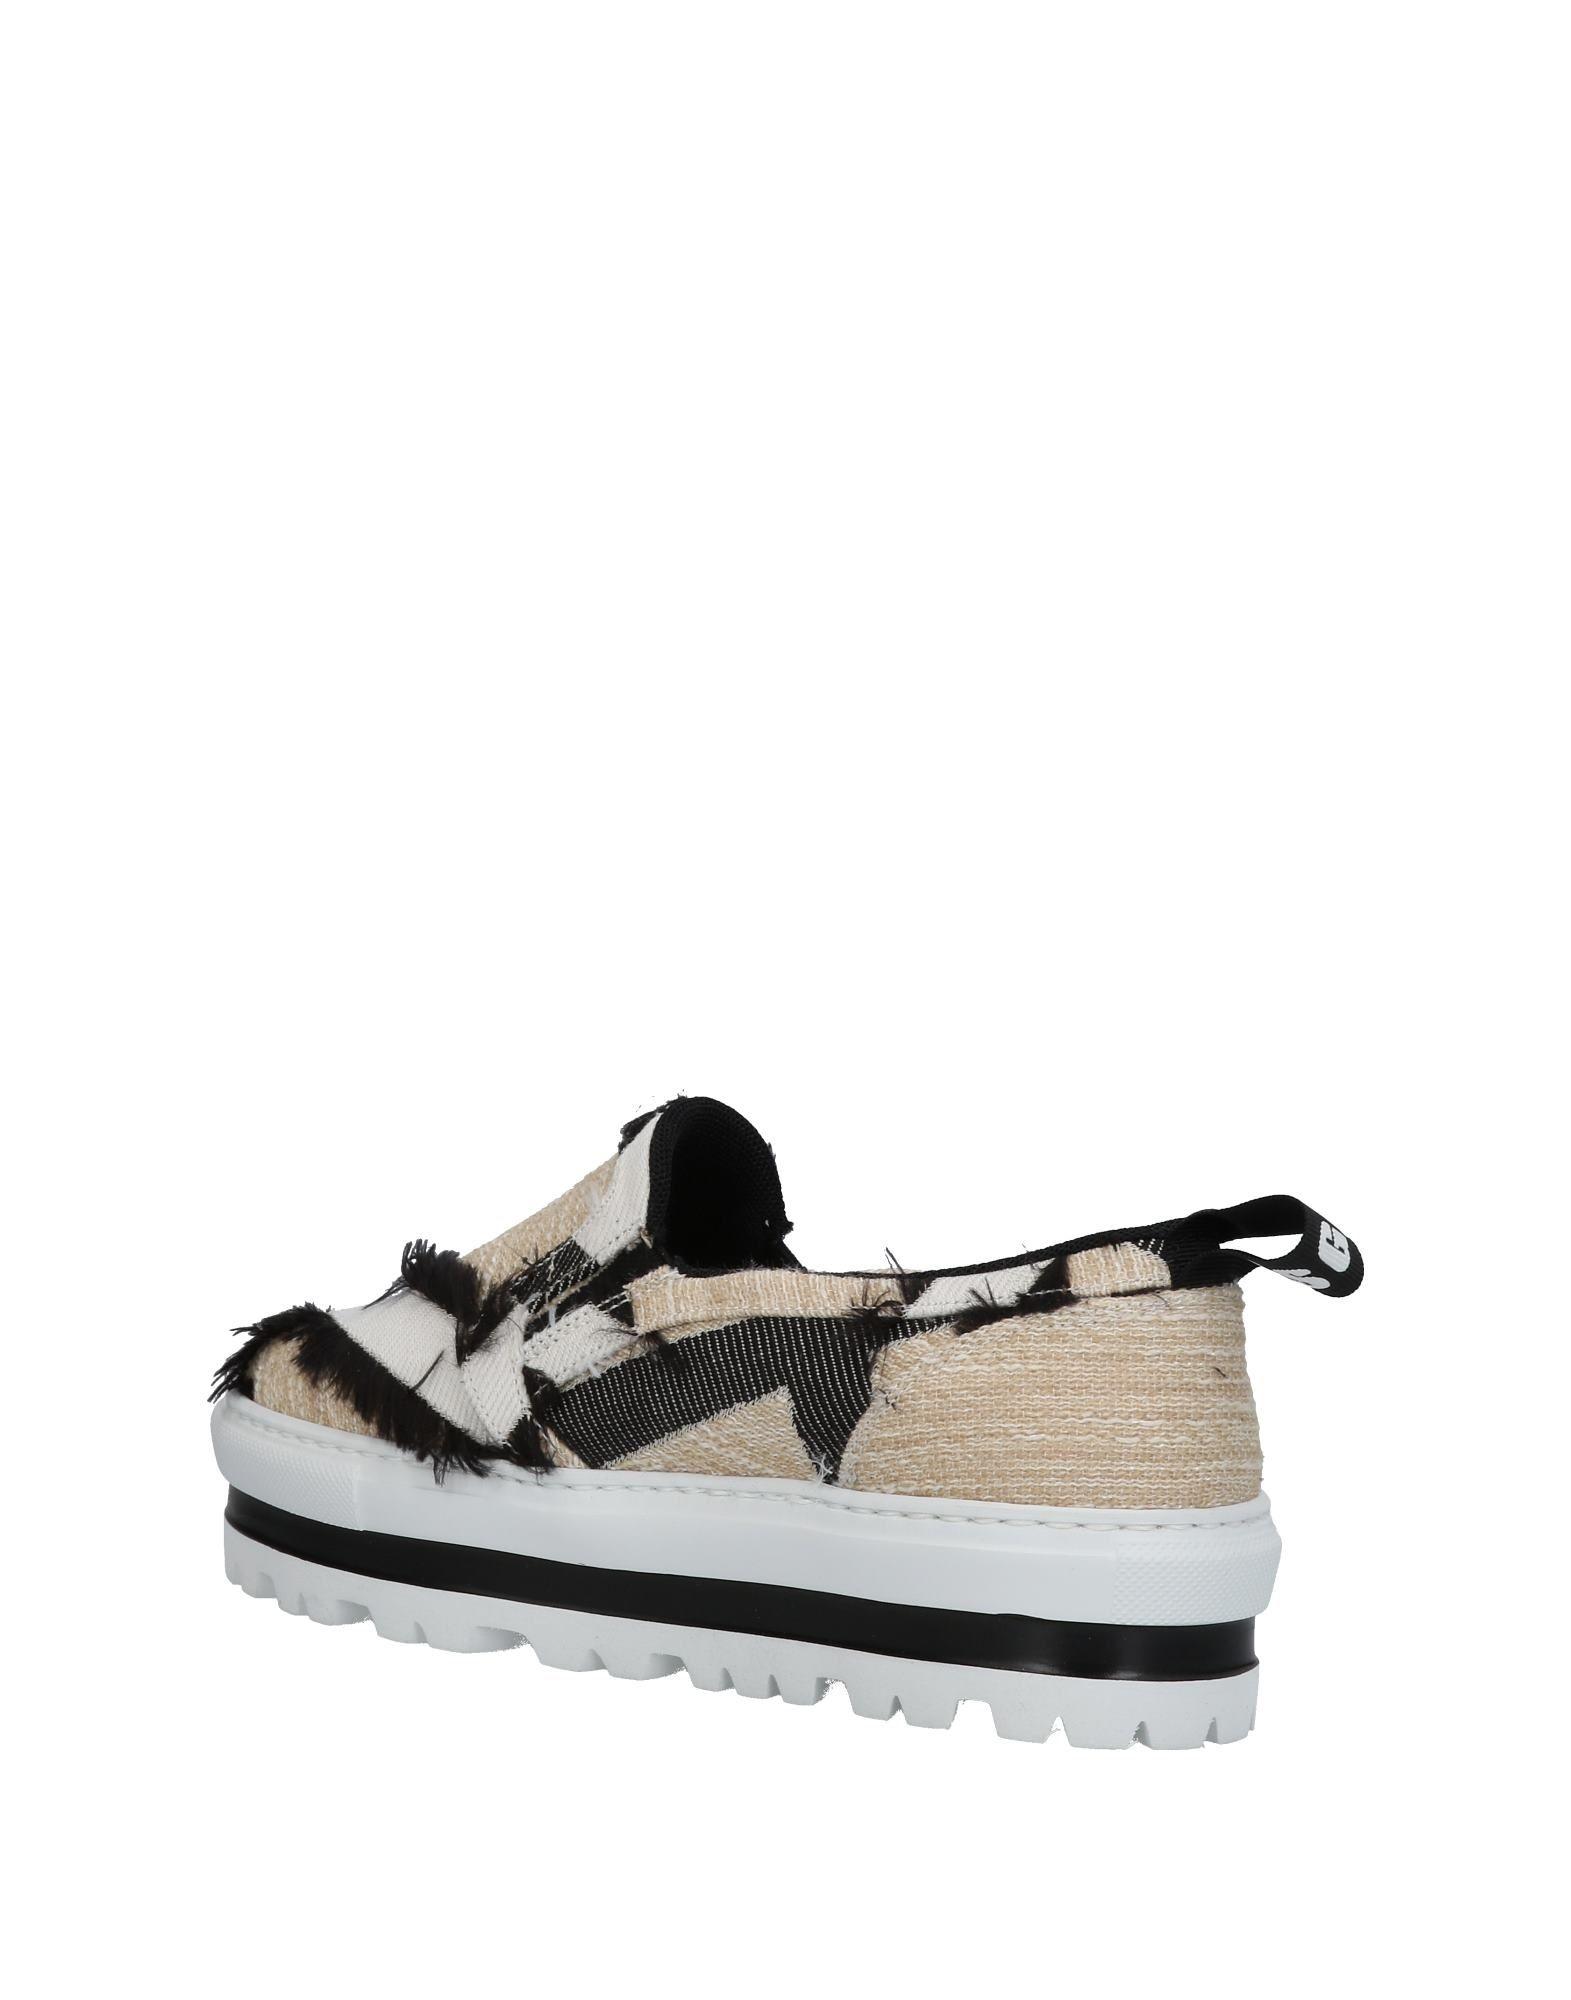 Rabatt Schuhe Msgm Damen Sneakers Damen Msgm  11419023SW 014748